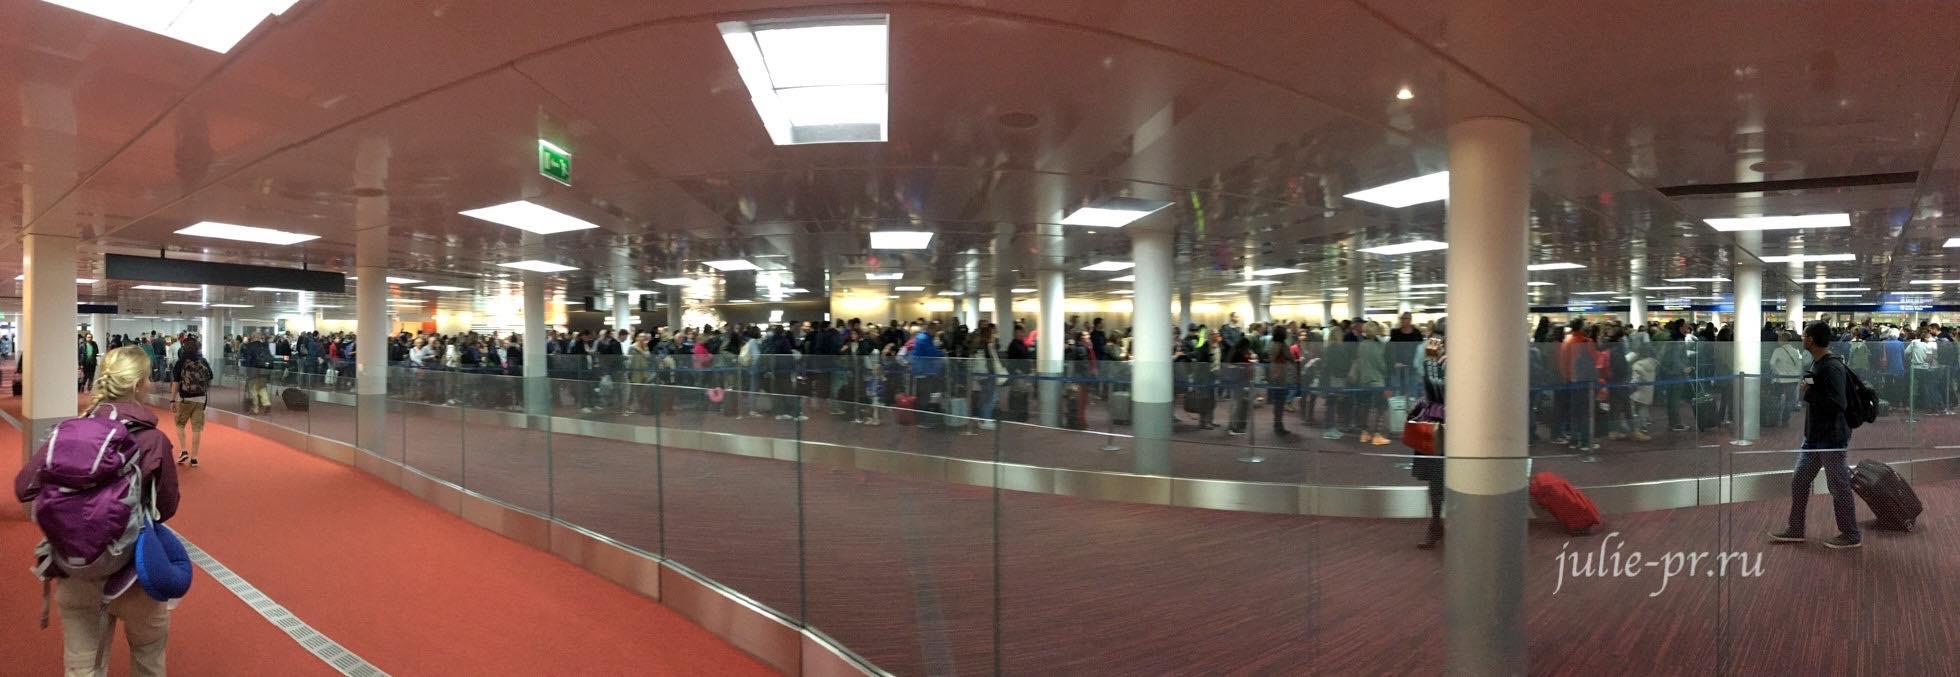 Франция, Париж, Очередь в аэропорту на границе